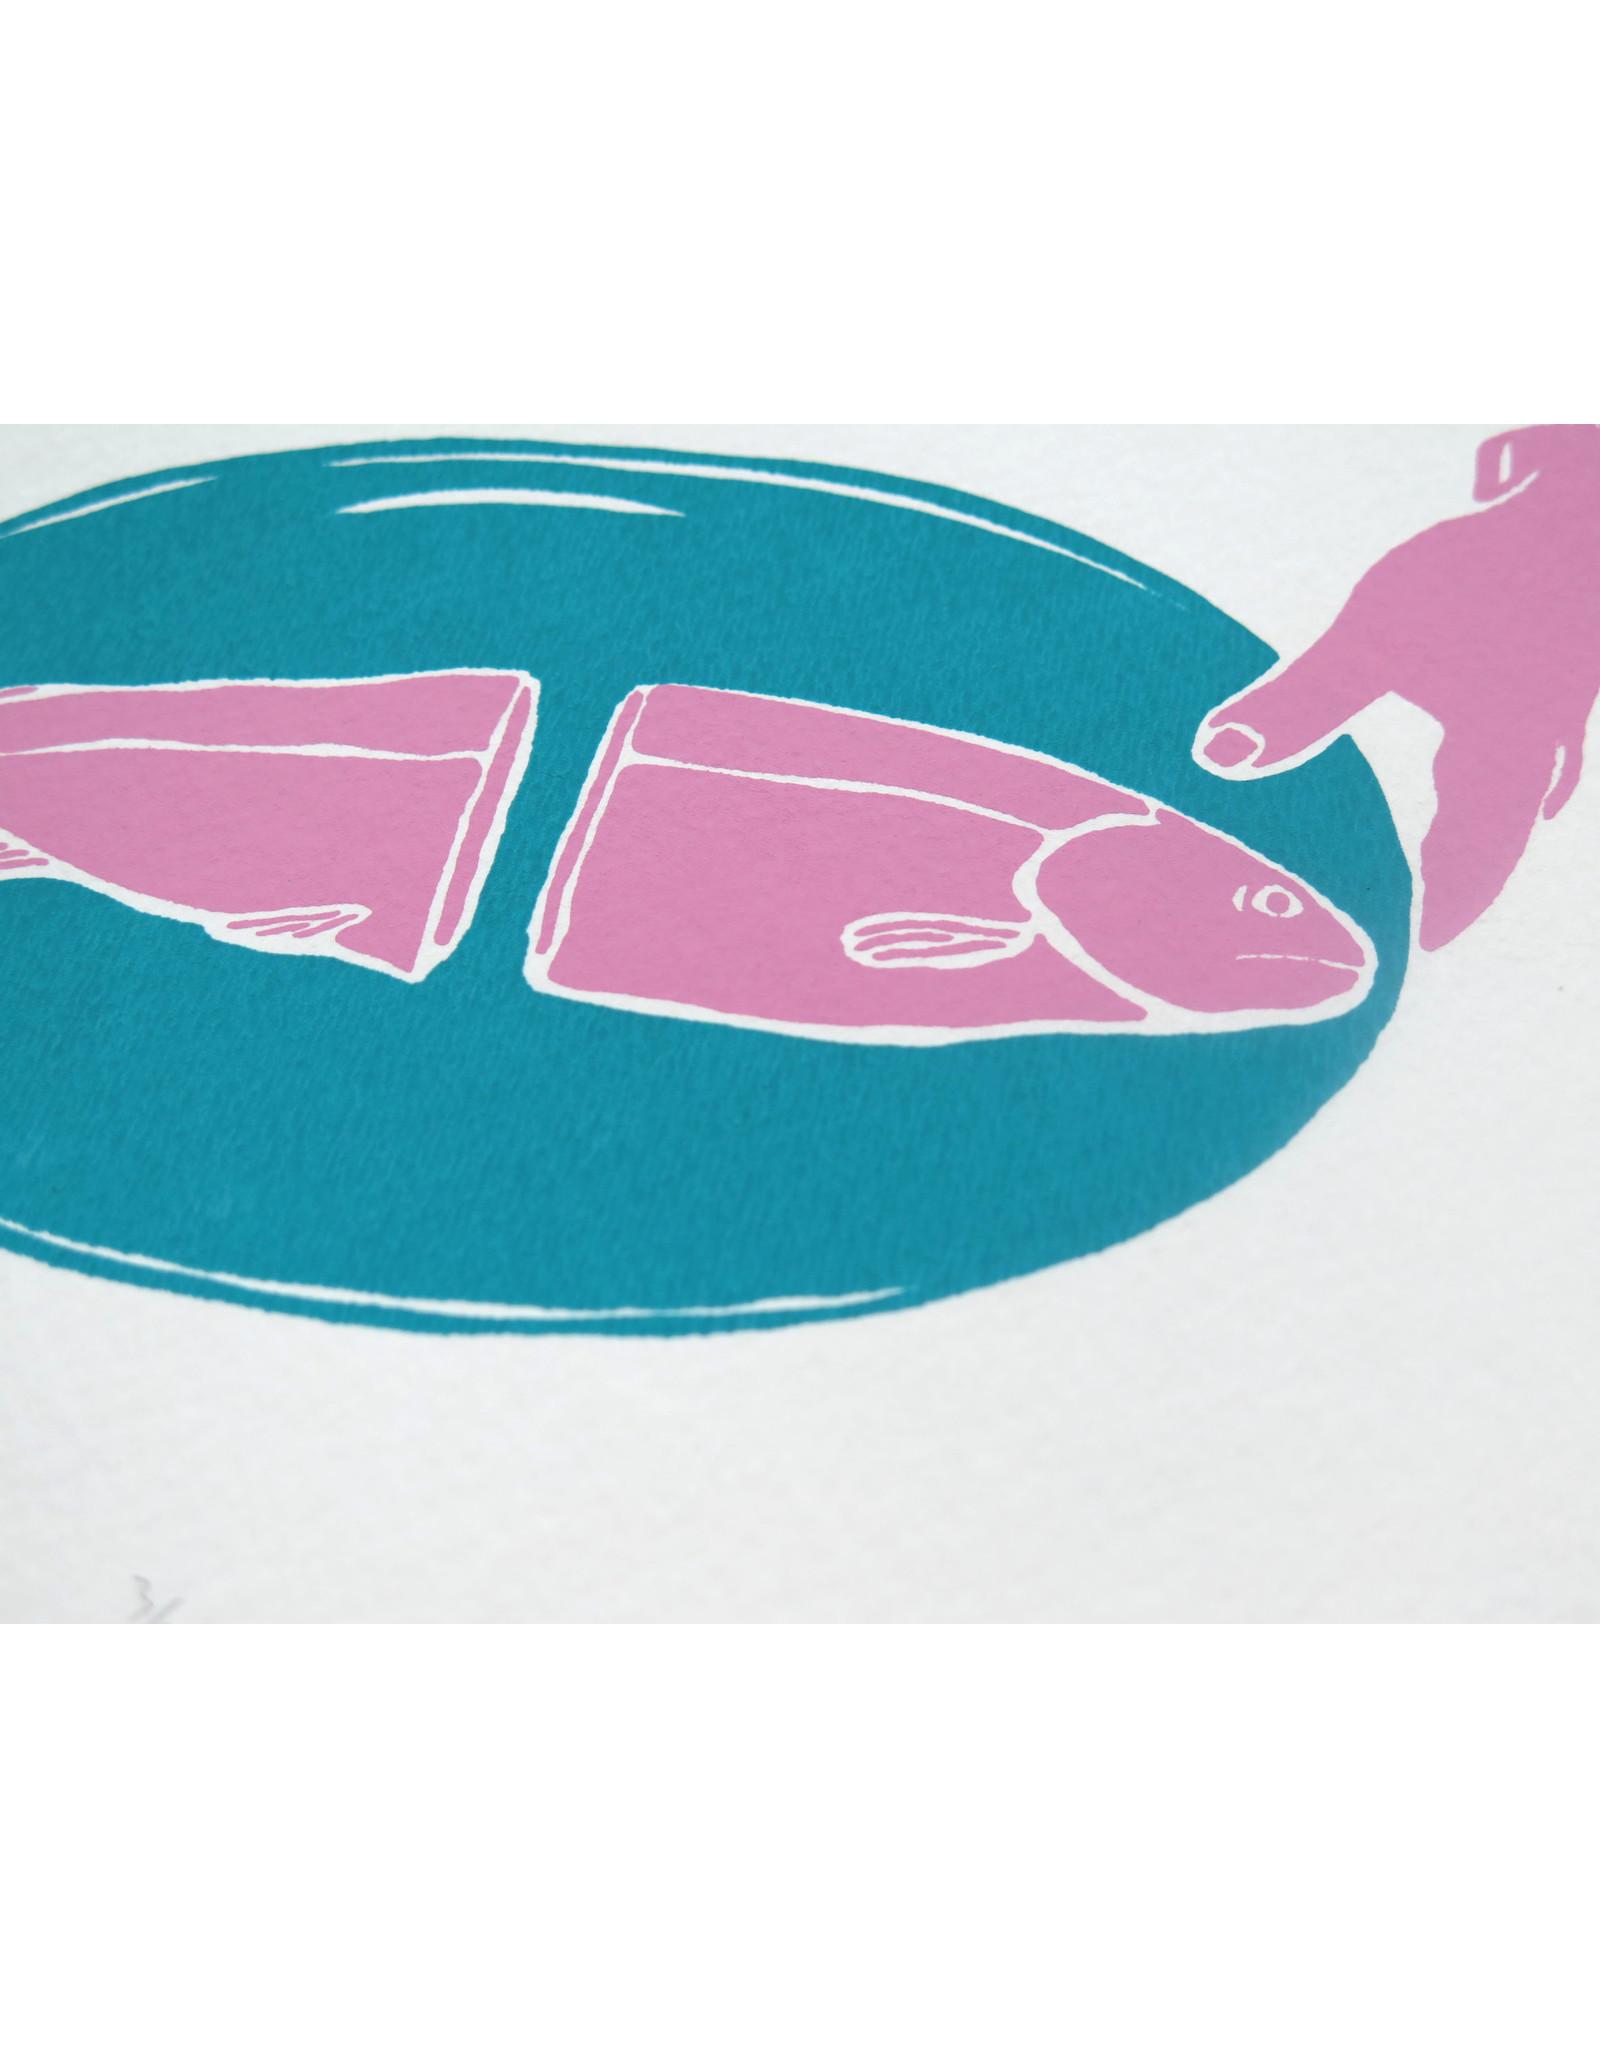 Pink Fish Screen Print by Kengi Yang